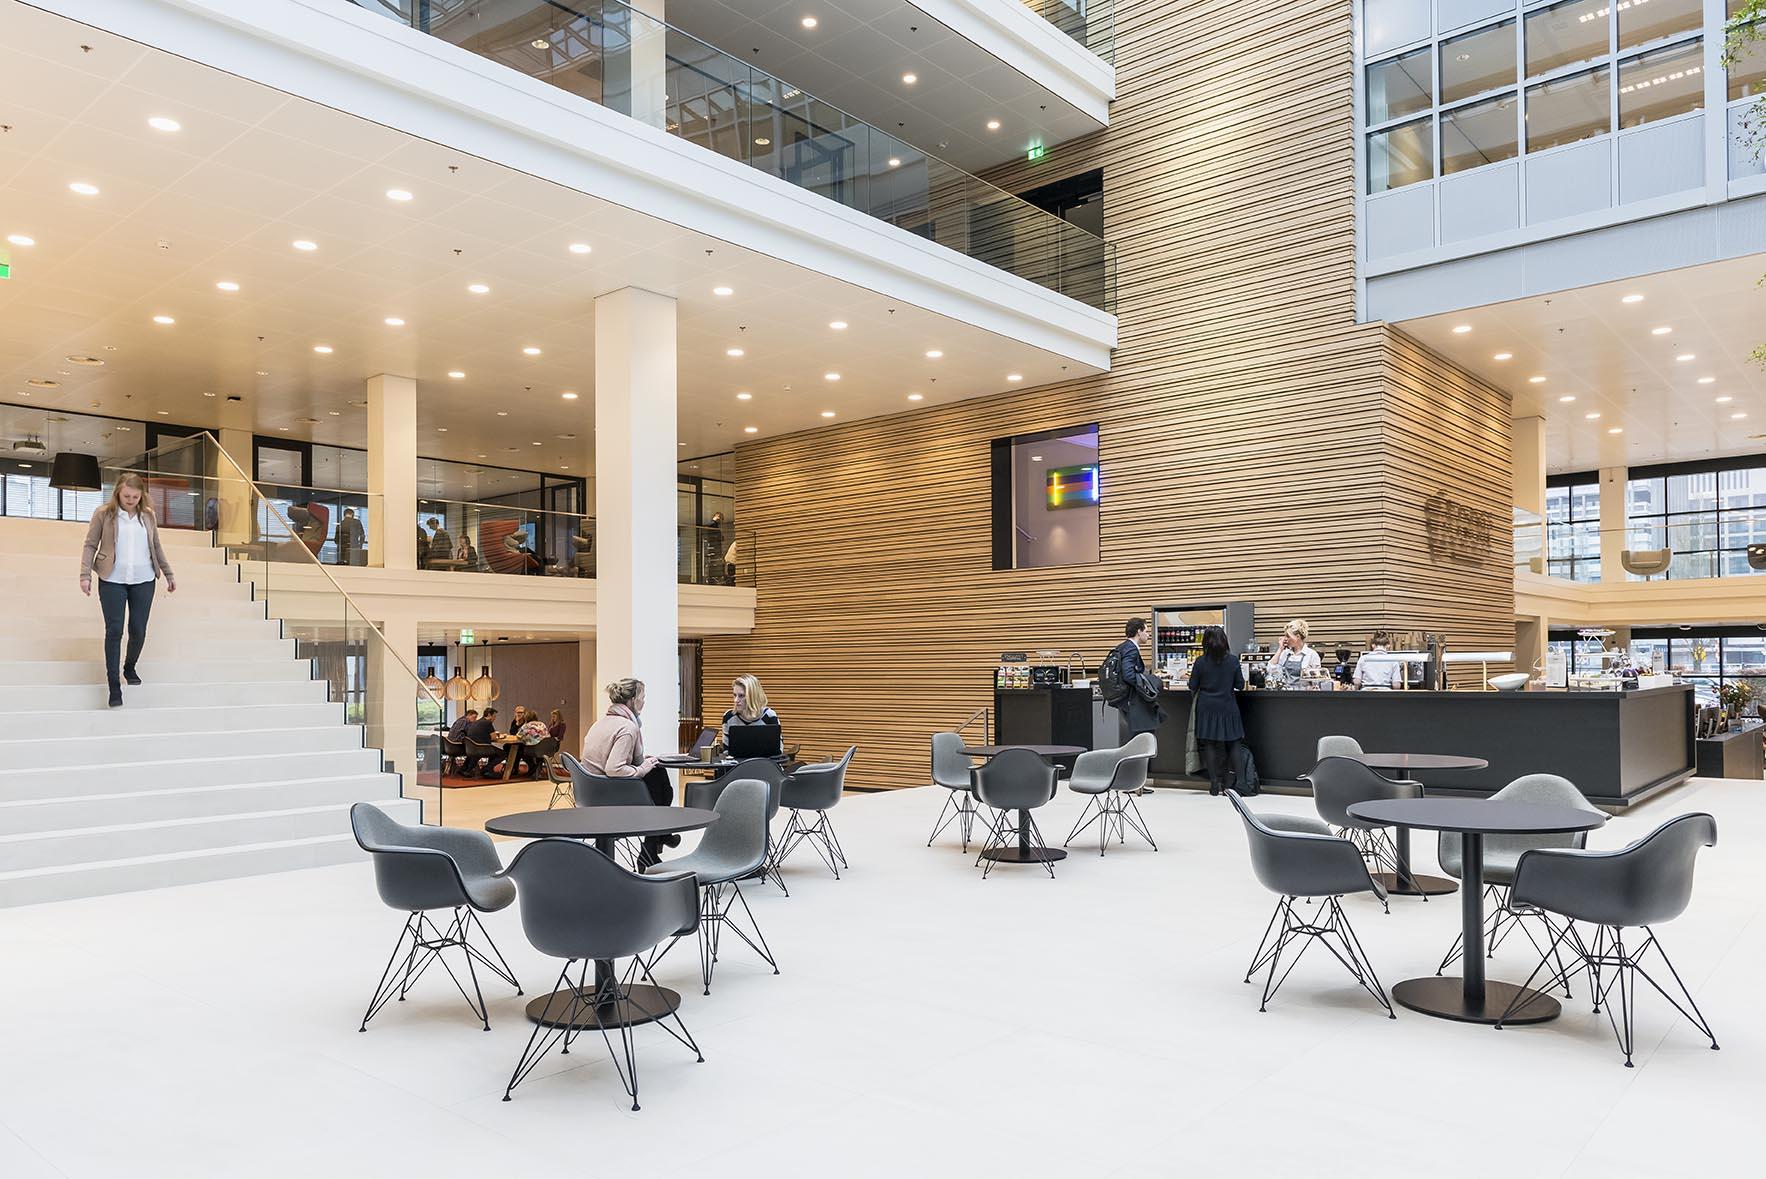 Interieur kantoor aegon leeuwarden oth de architect for Interieur bedrijven